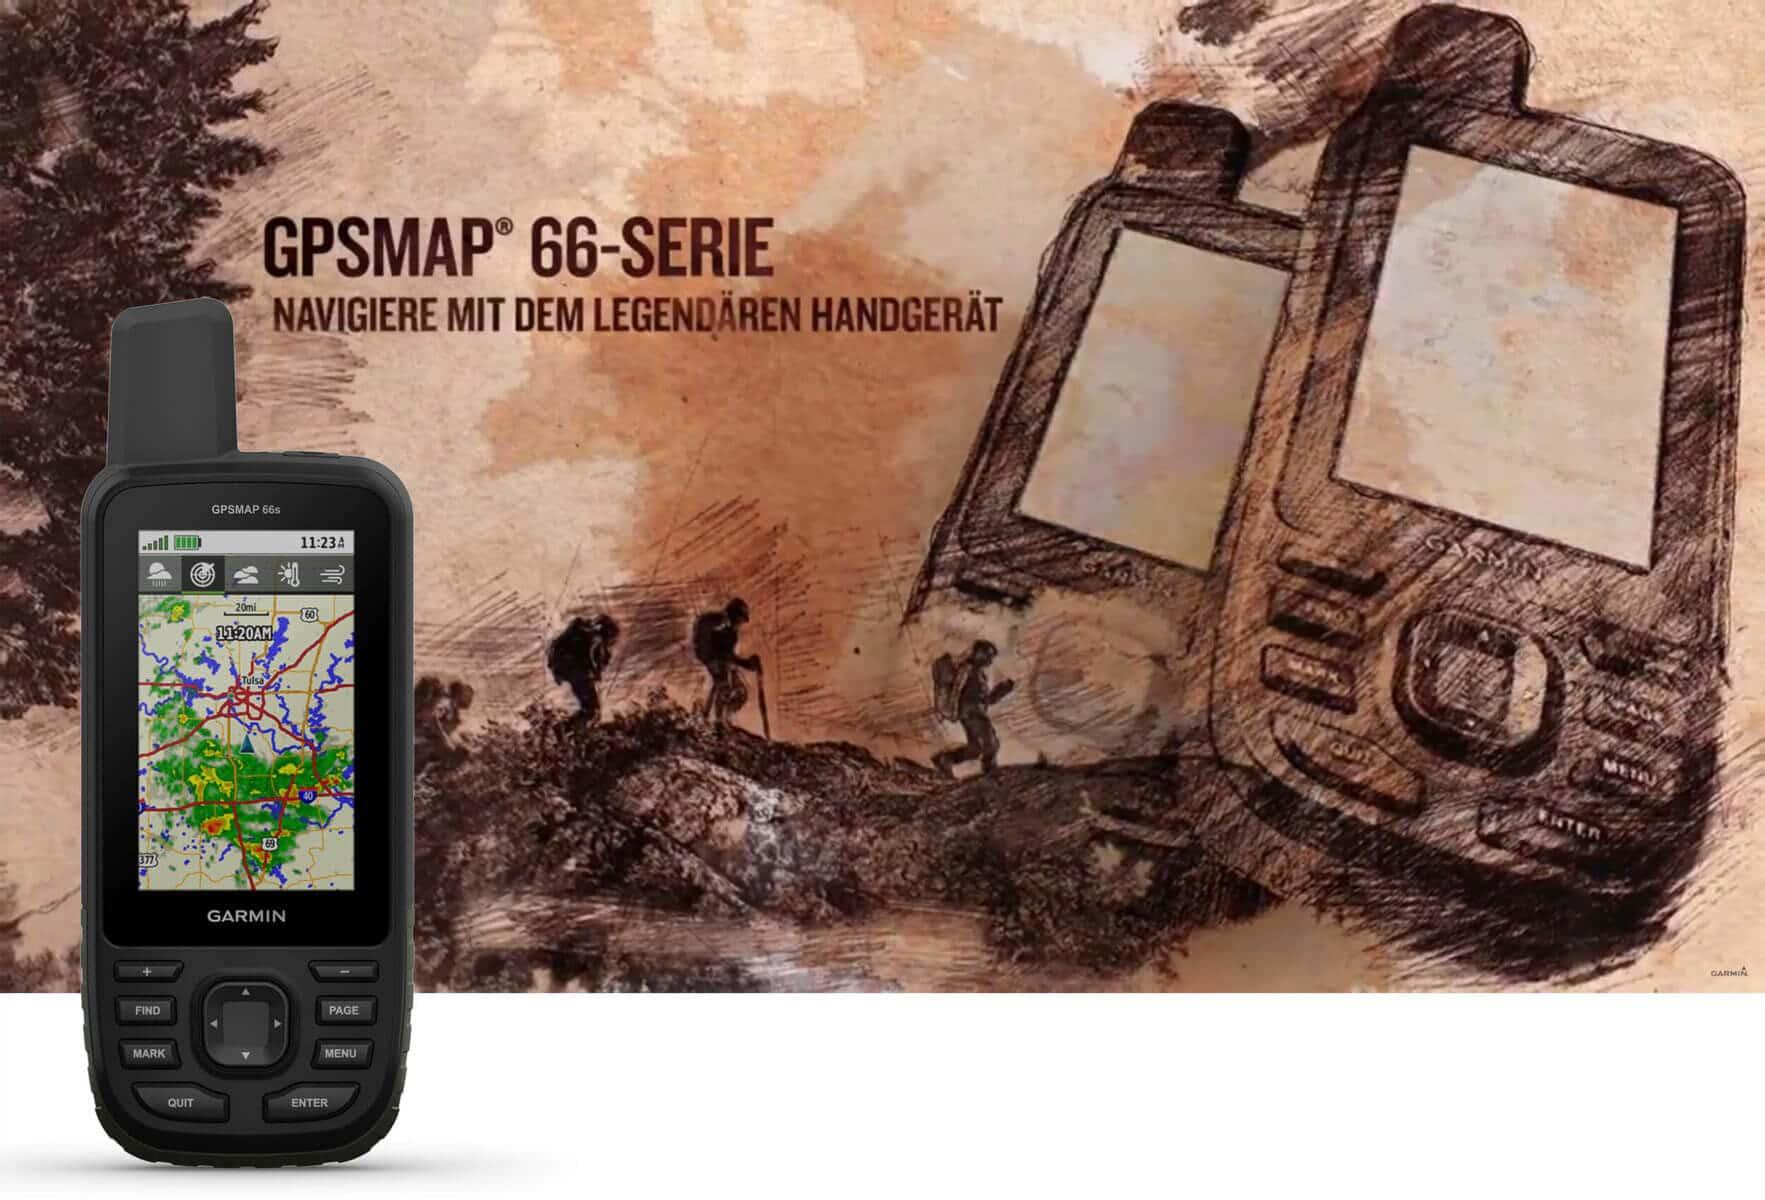 Garmin GPSMAP 66st im Test